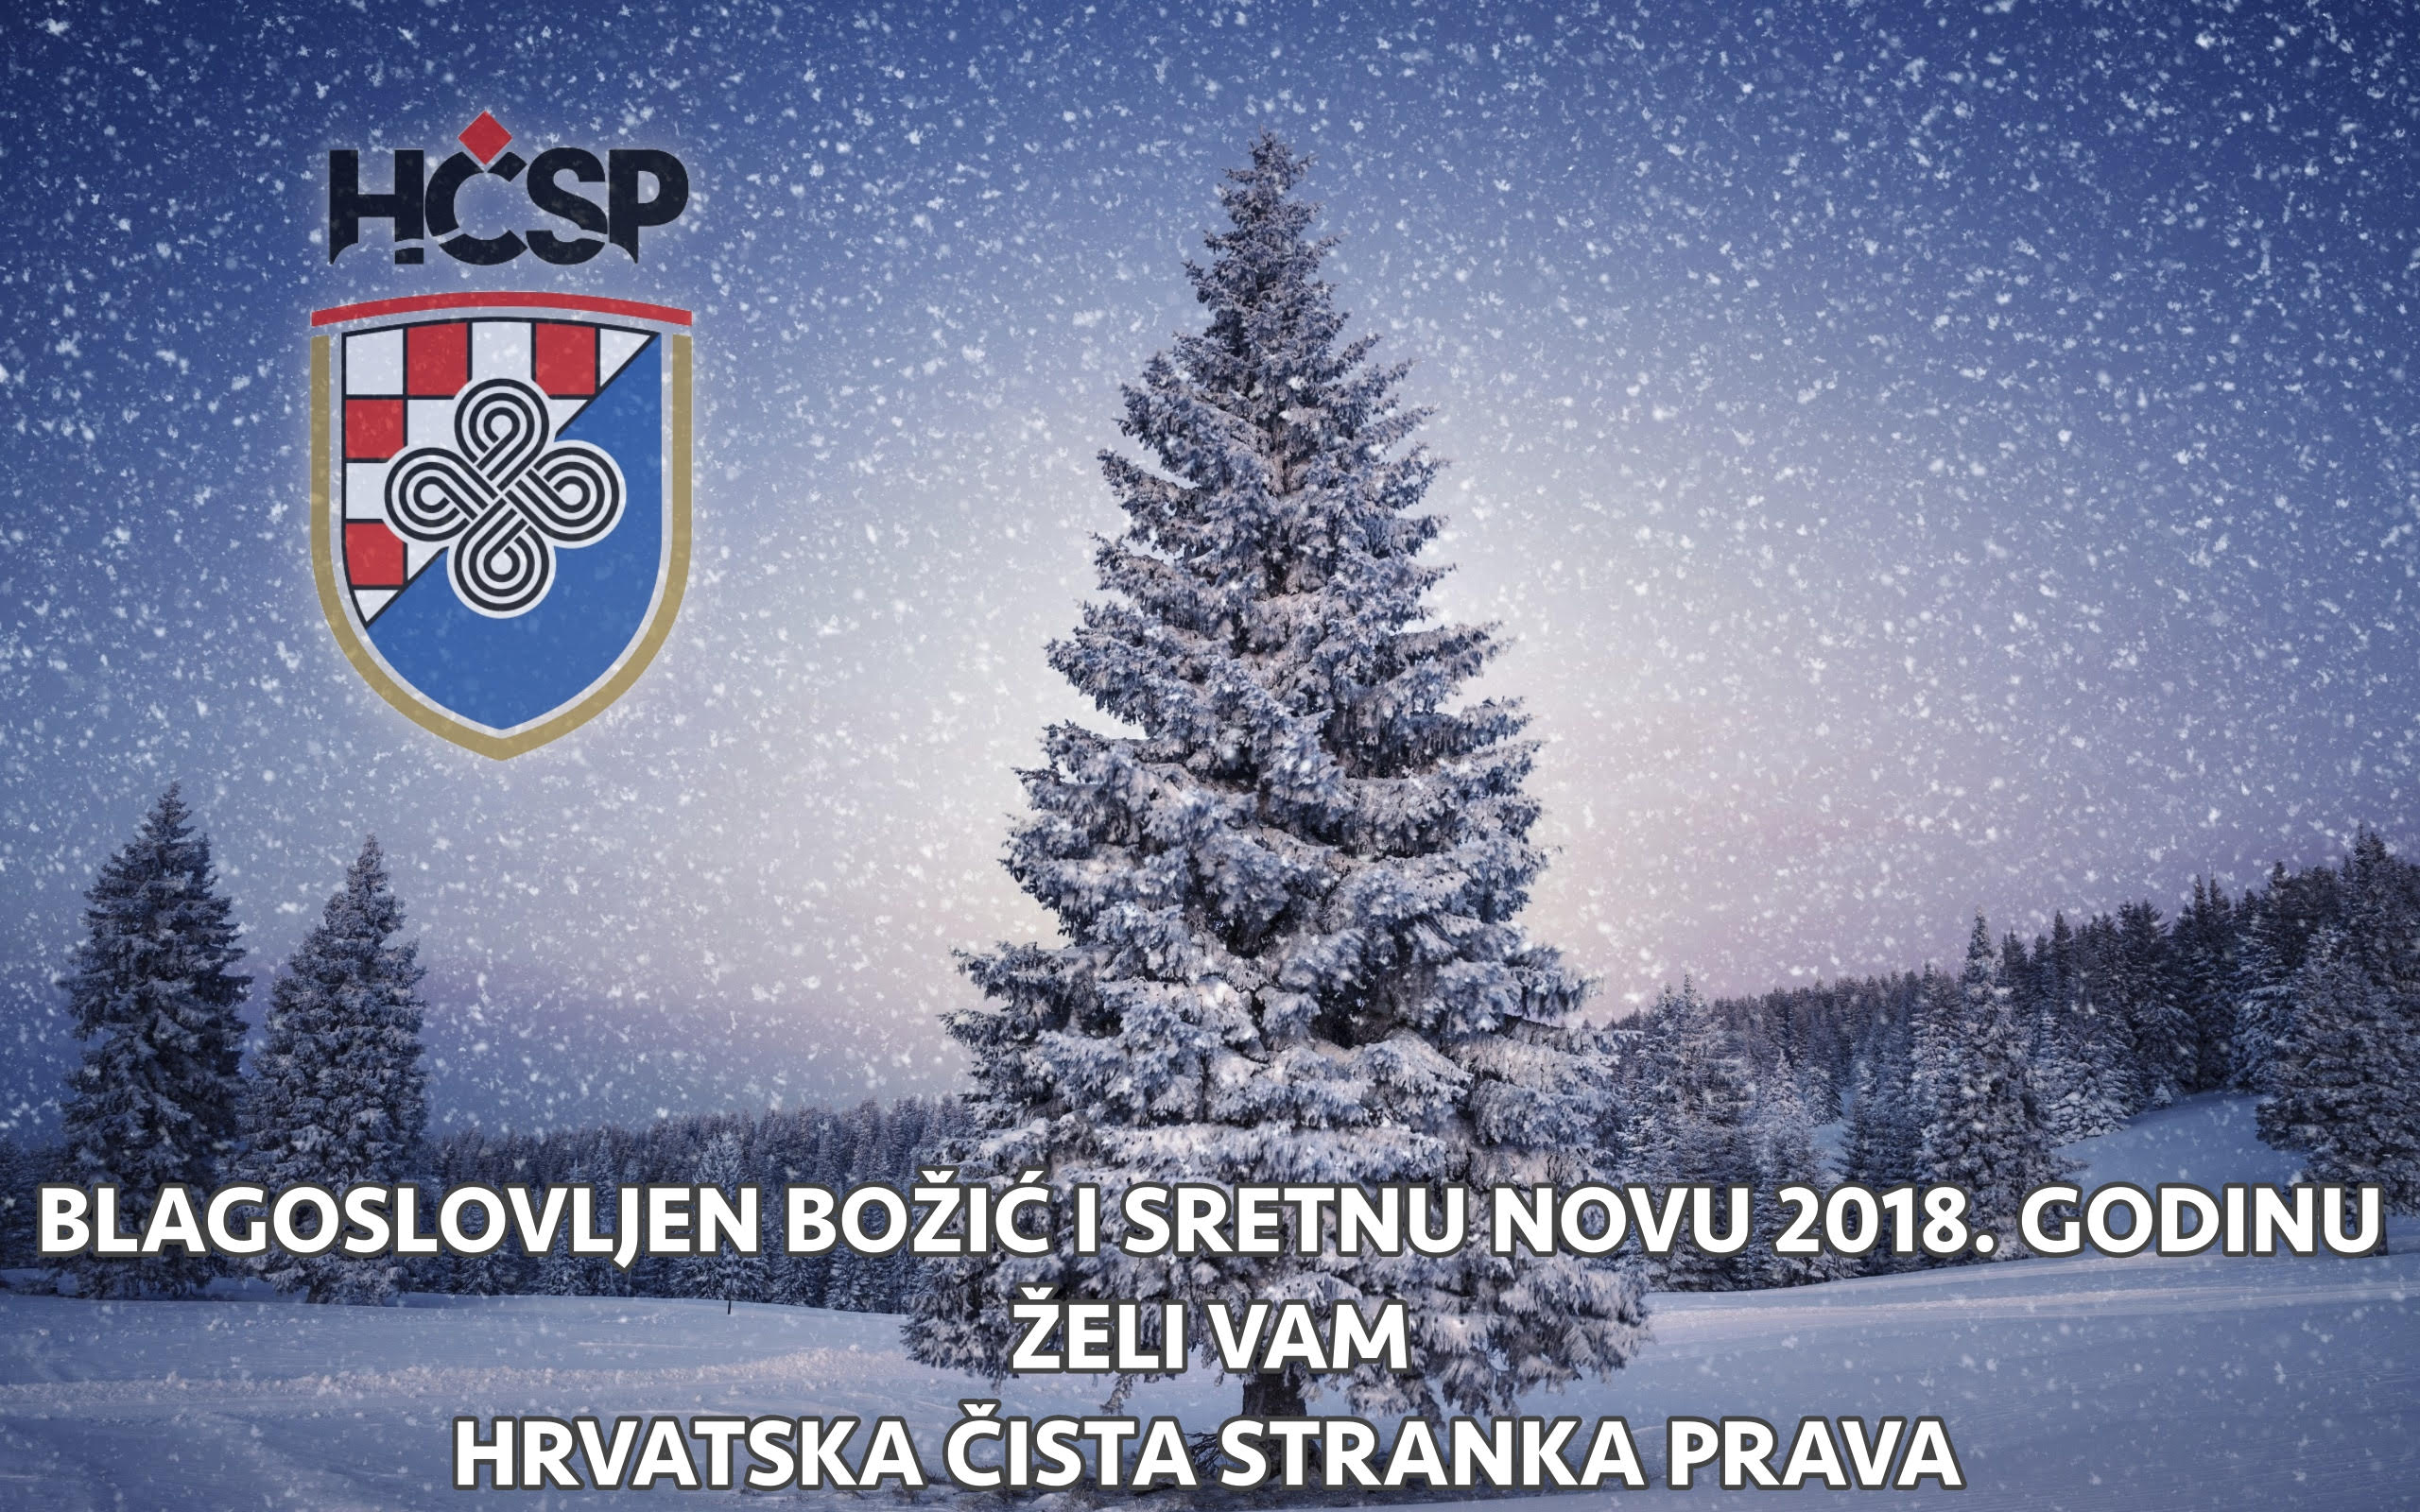 cestitka_hcsp